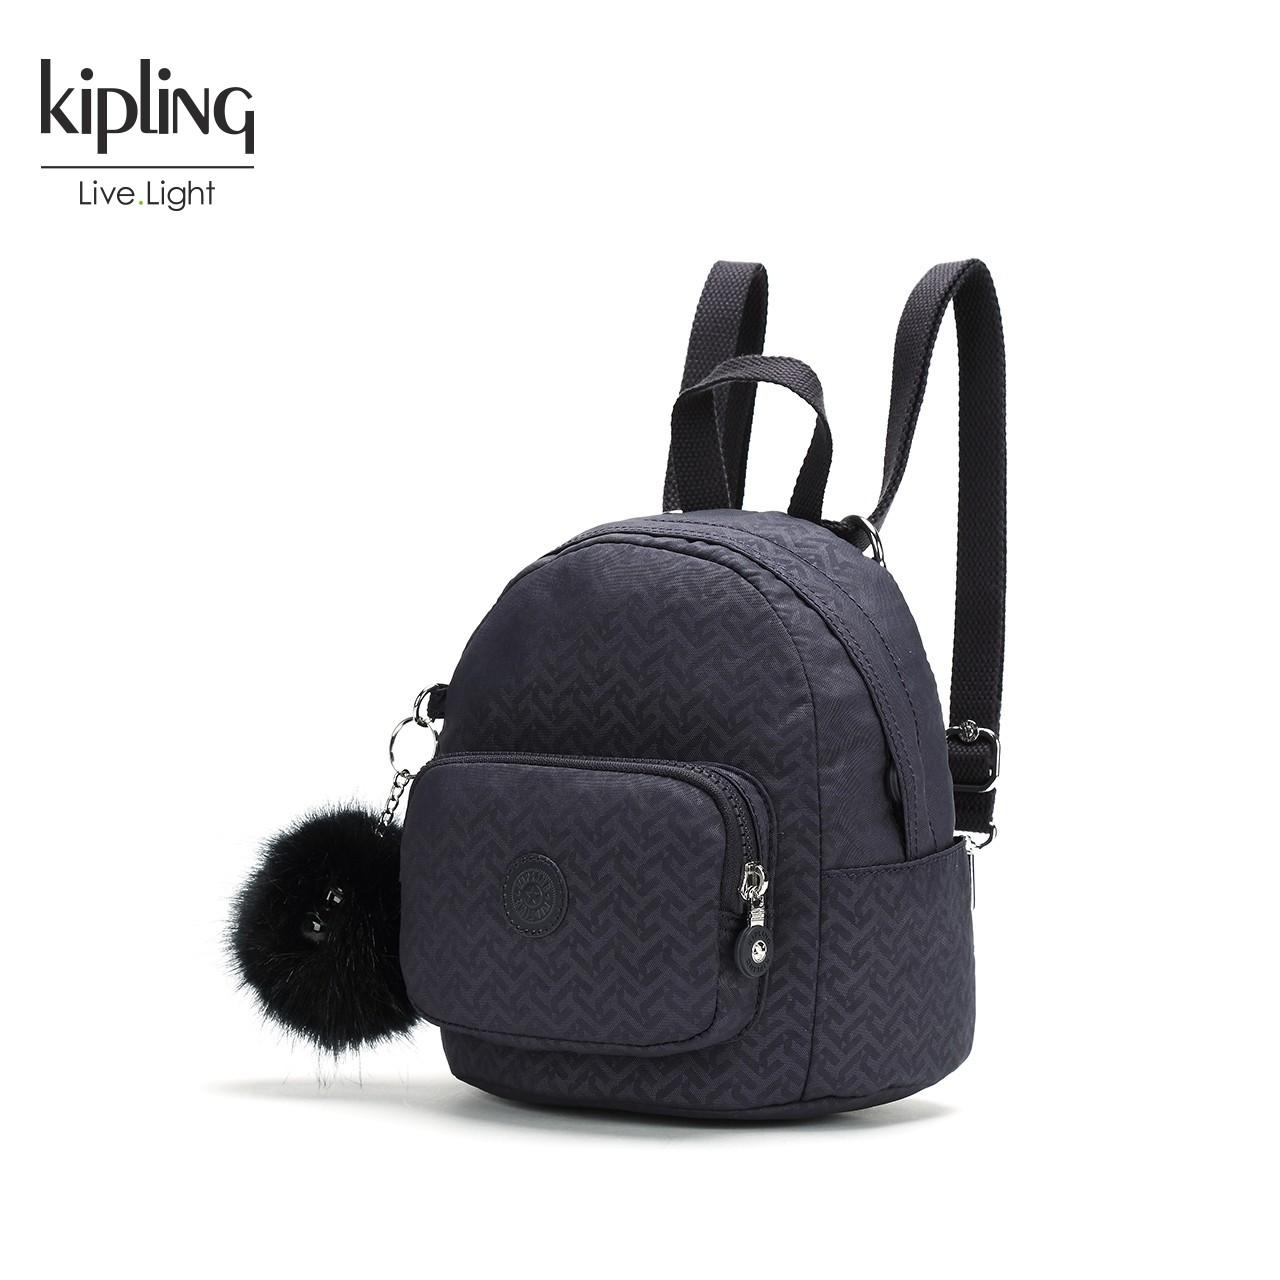 Kipling凯浦林官网包包女2018新款K12682迷你双肩包ins包小巧背包